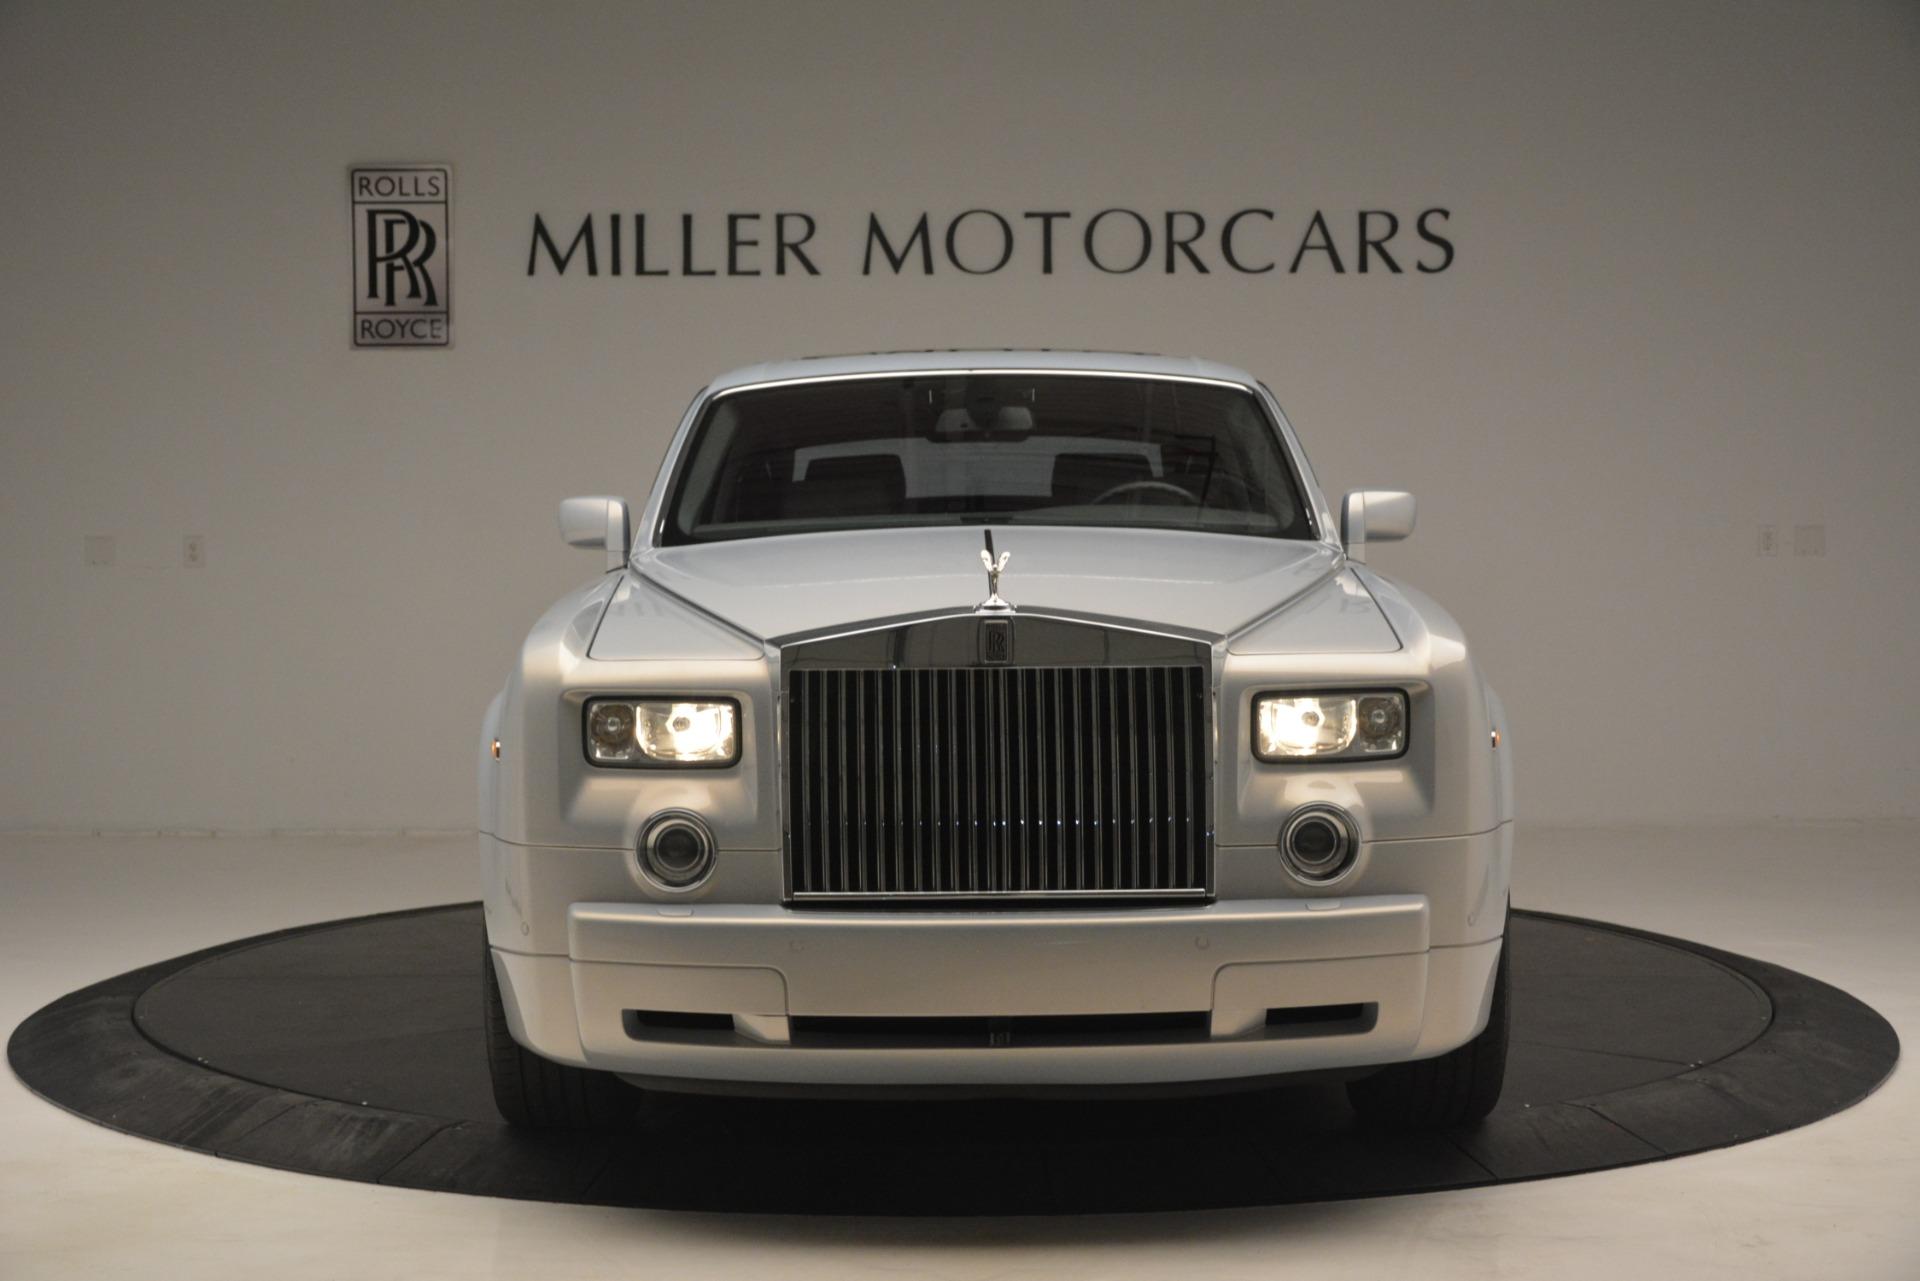 Used 2007 Rolls-Royce Phantom  For Sale In Greenwich, CT 3089_p2